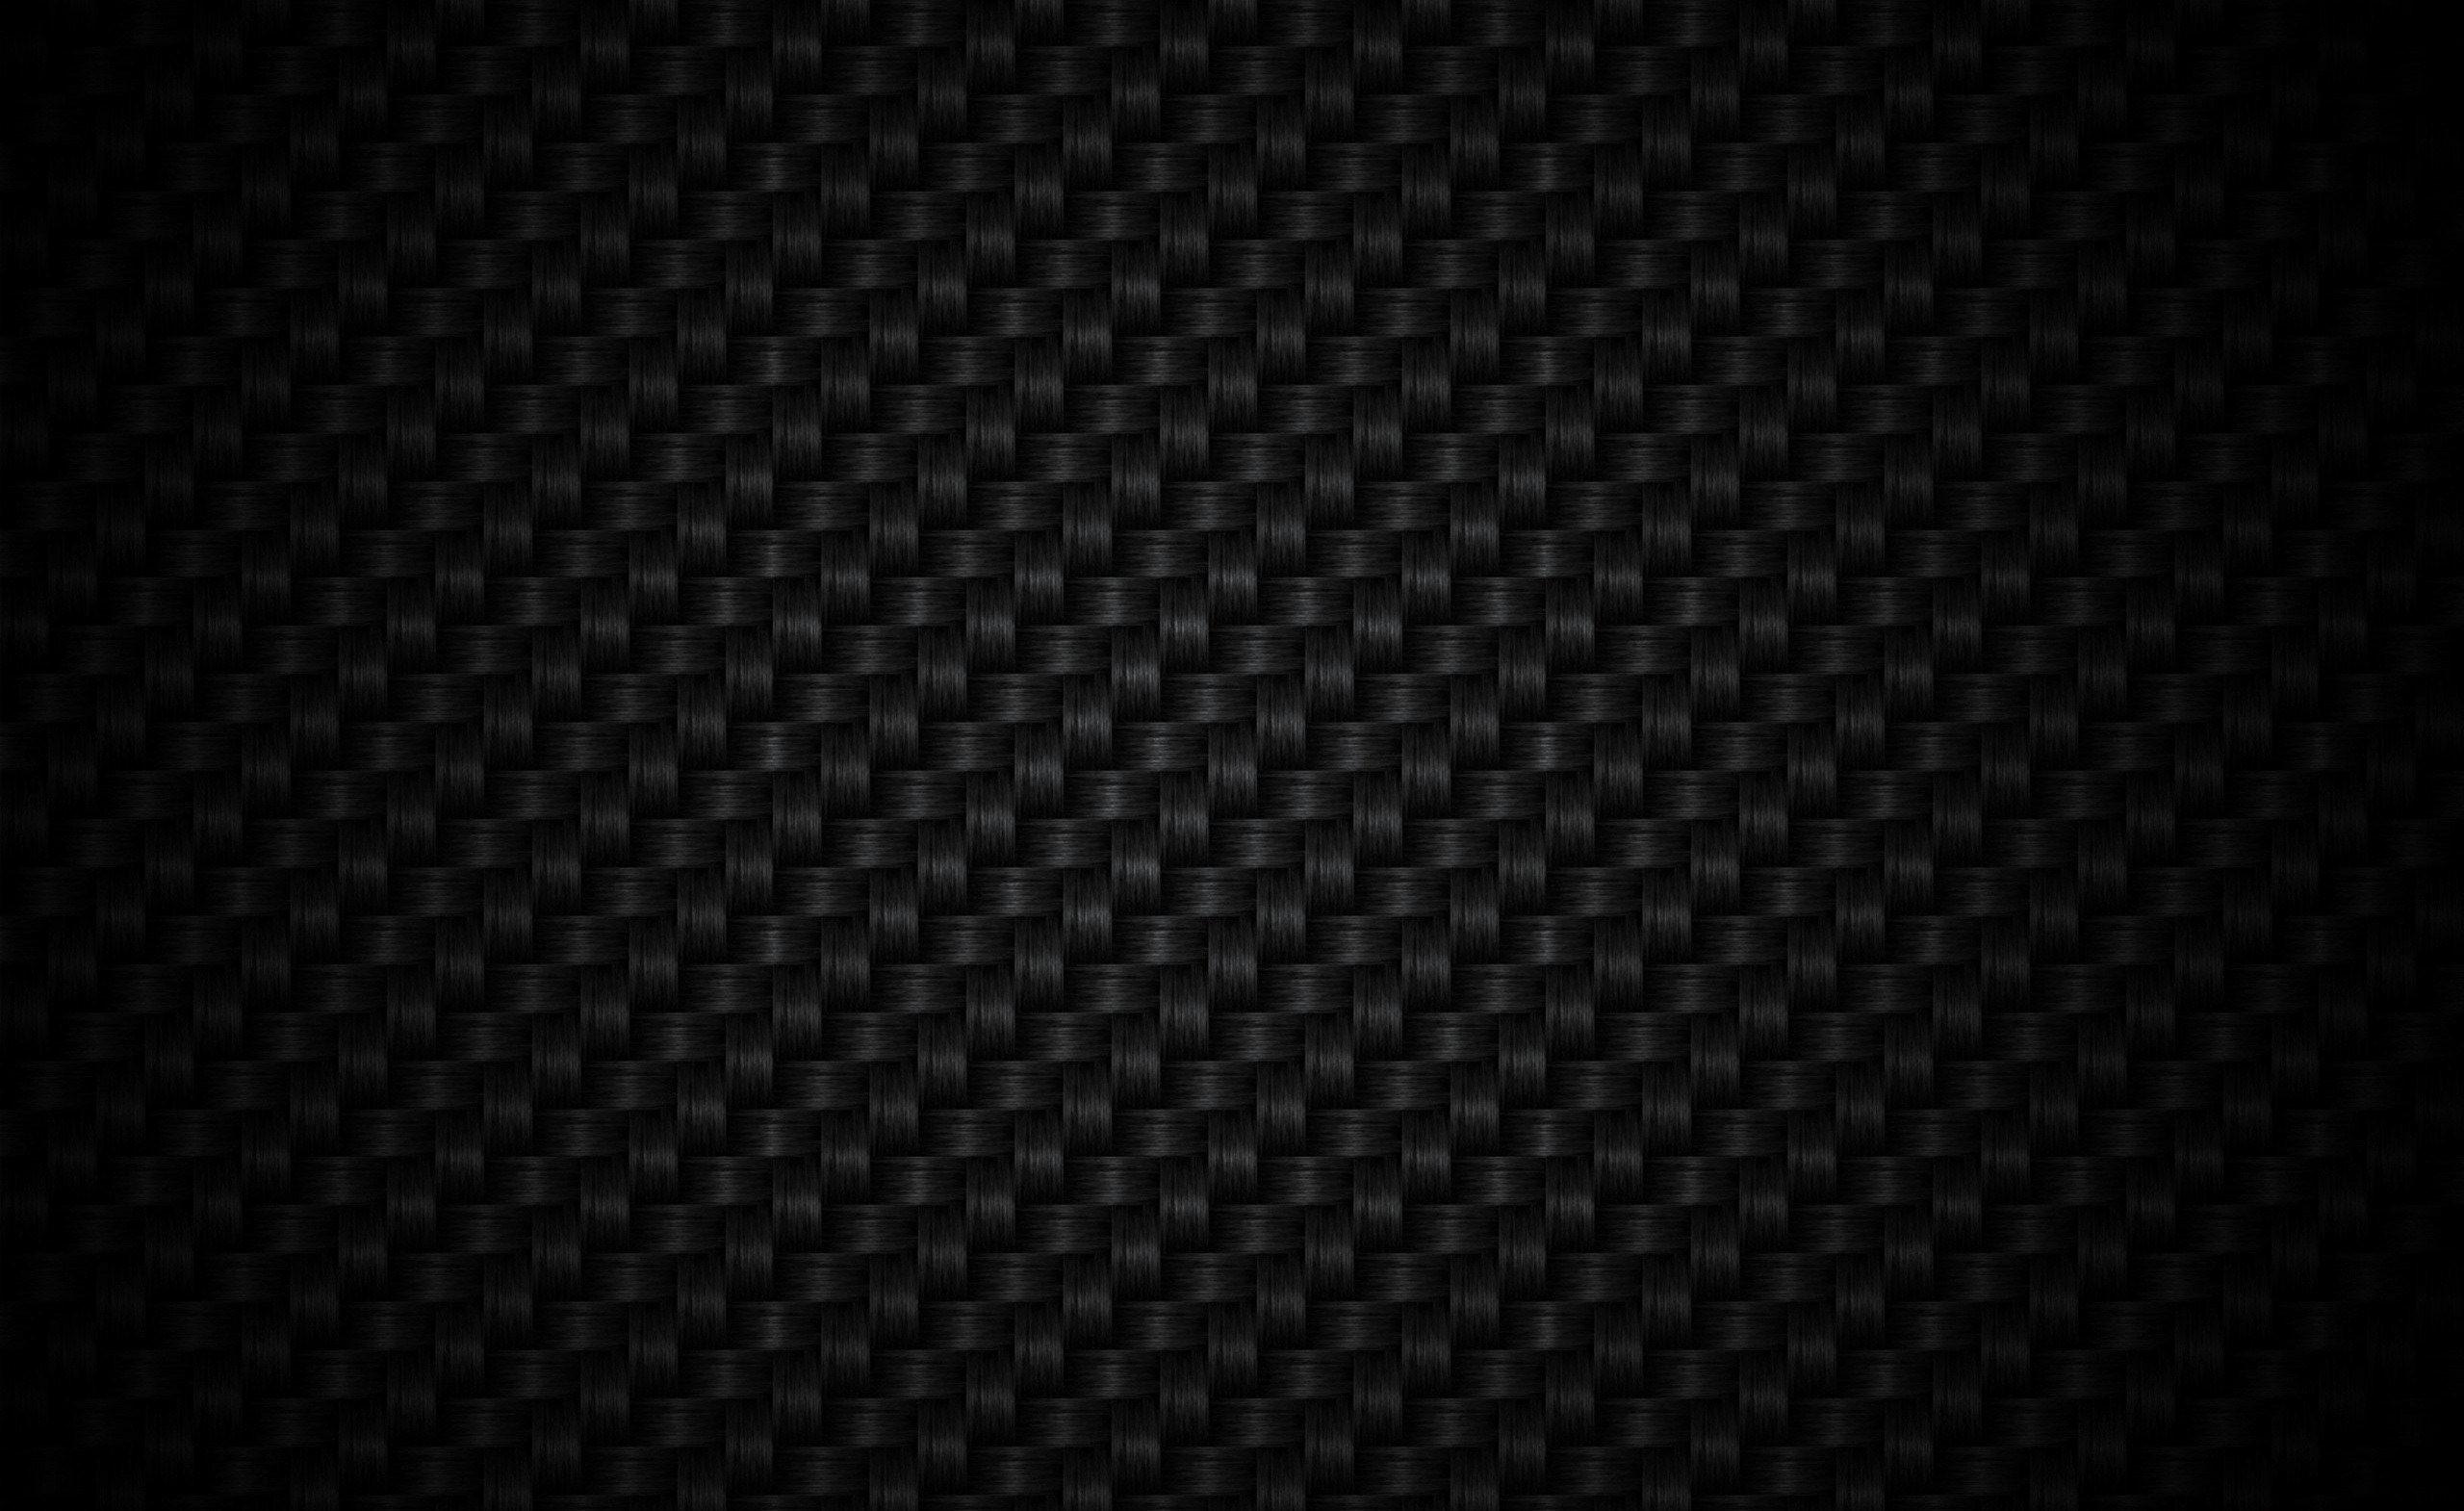 Plain Color Wallpaper For Iphone Plain Black Wallpapers Hd 74 Images